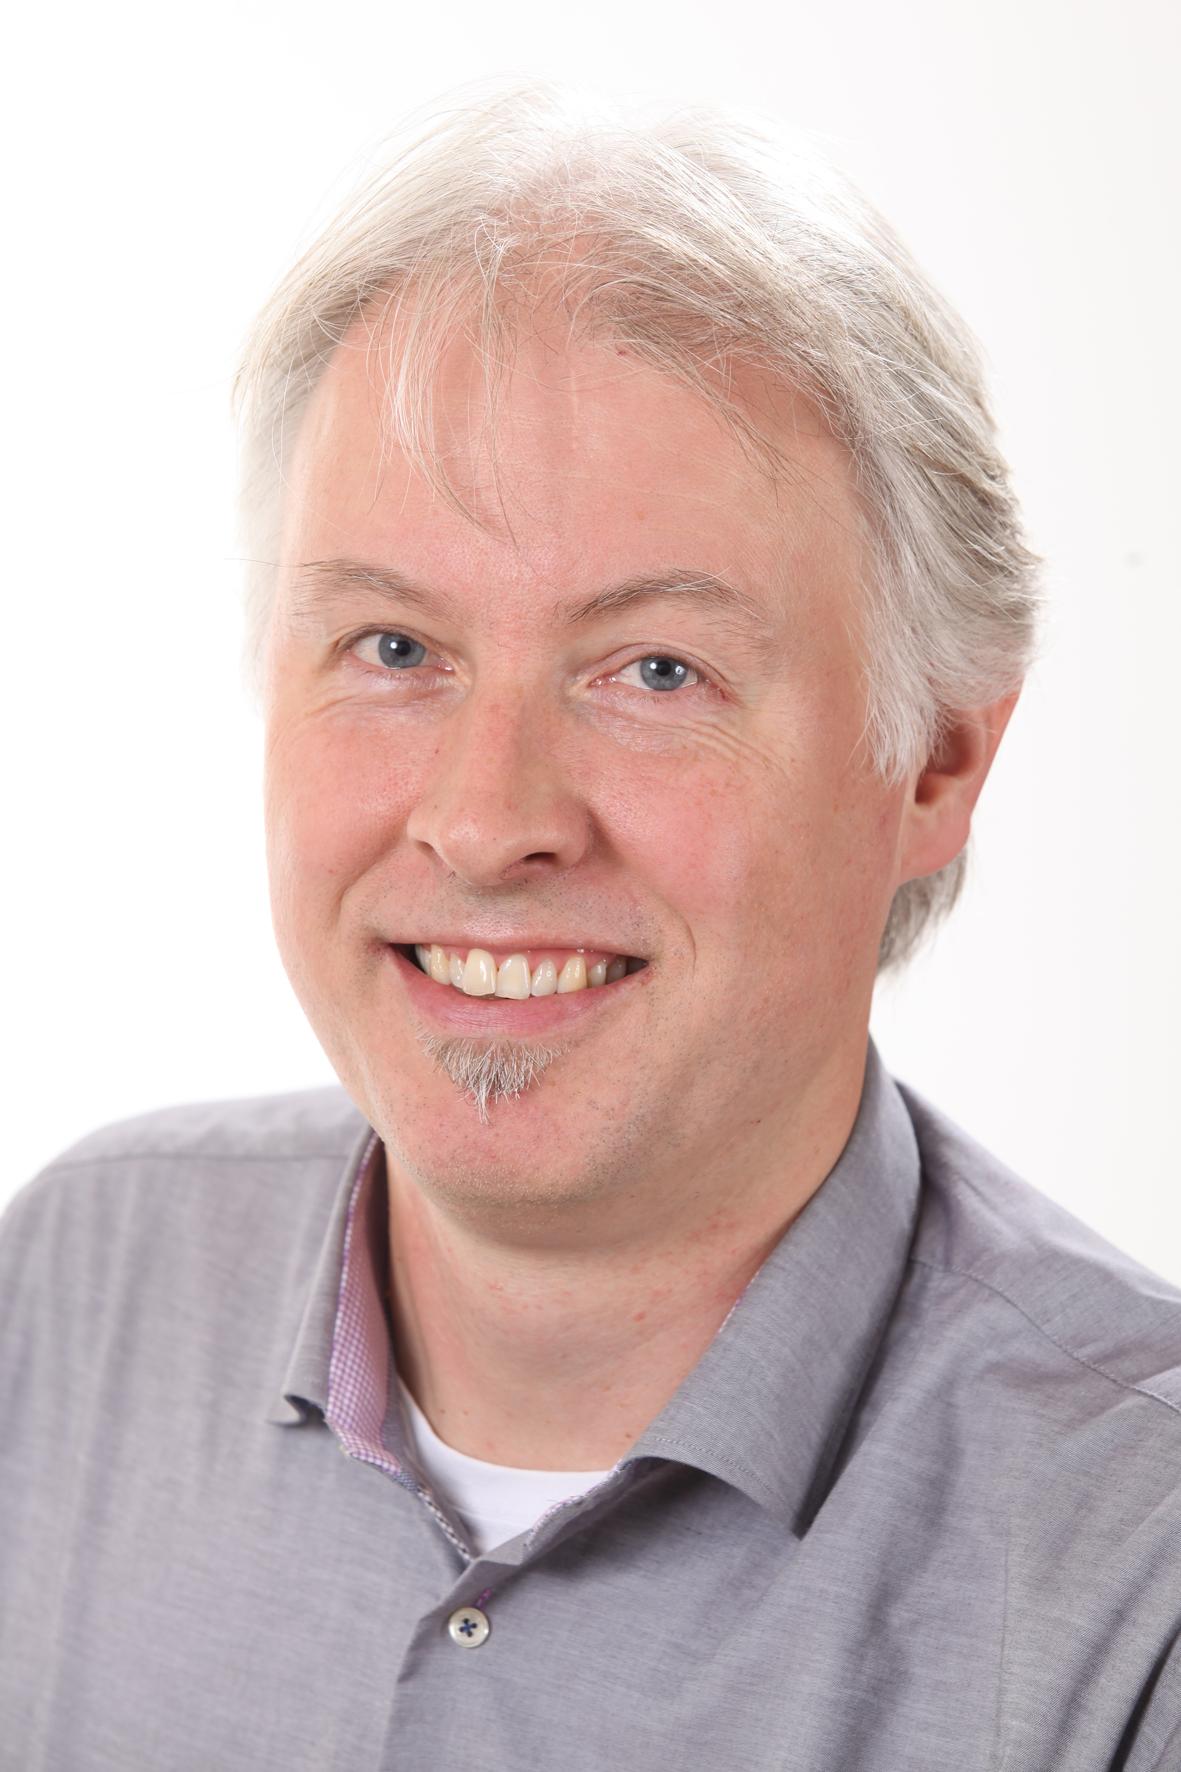 Mark Wiggerman